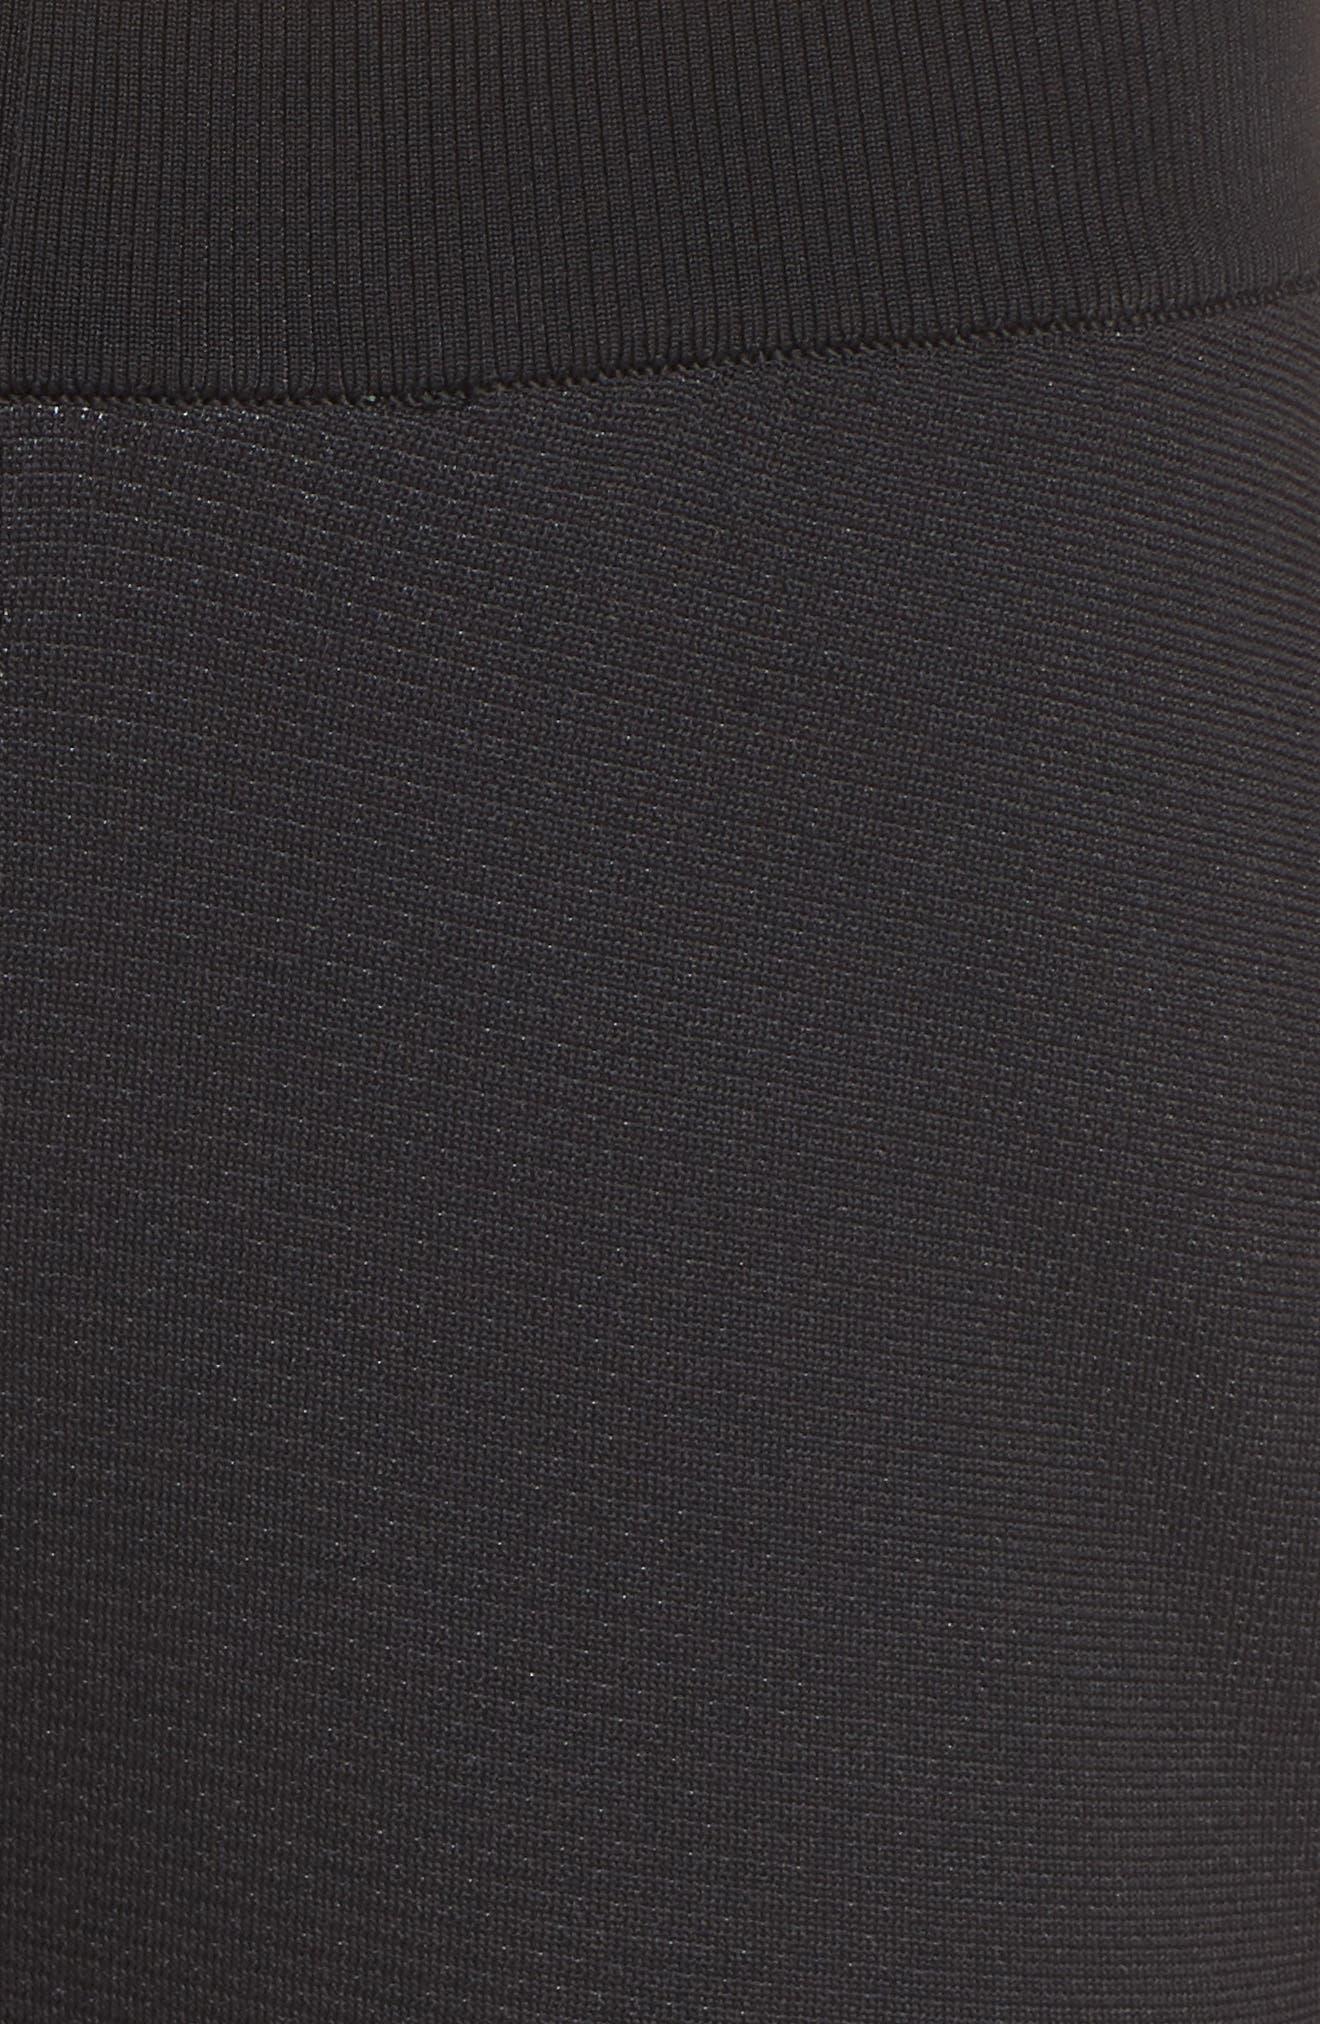 ID Striker Knit Pants,                             Alternate thumbnail 6, color,                             BLACK